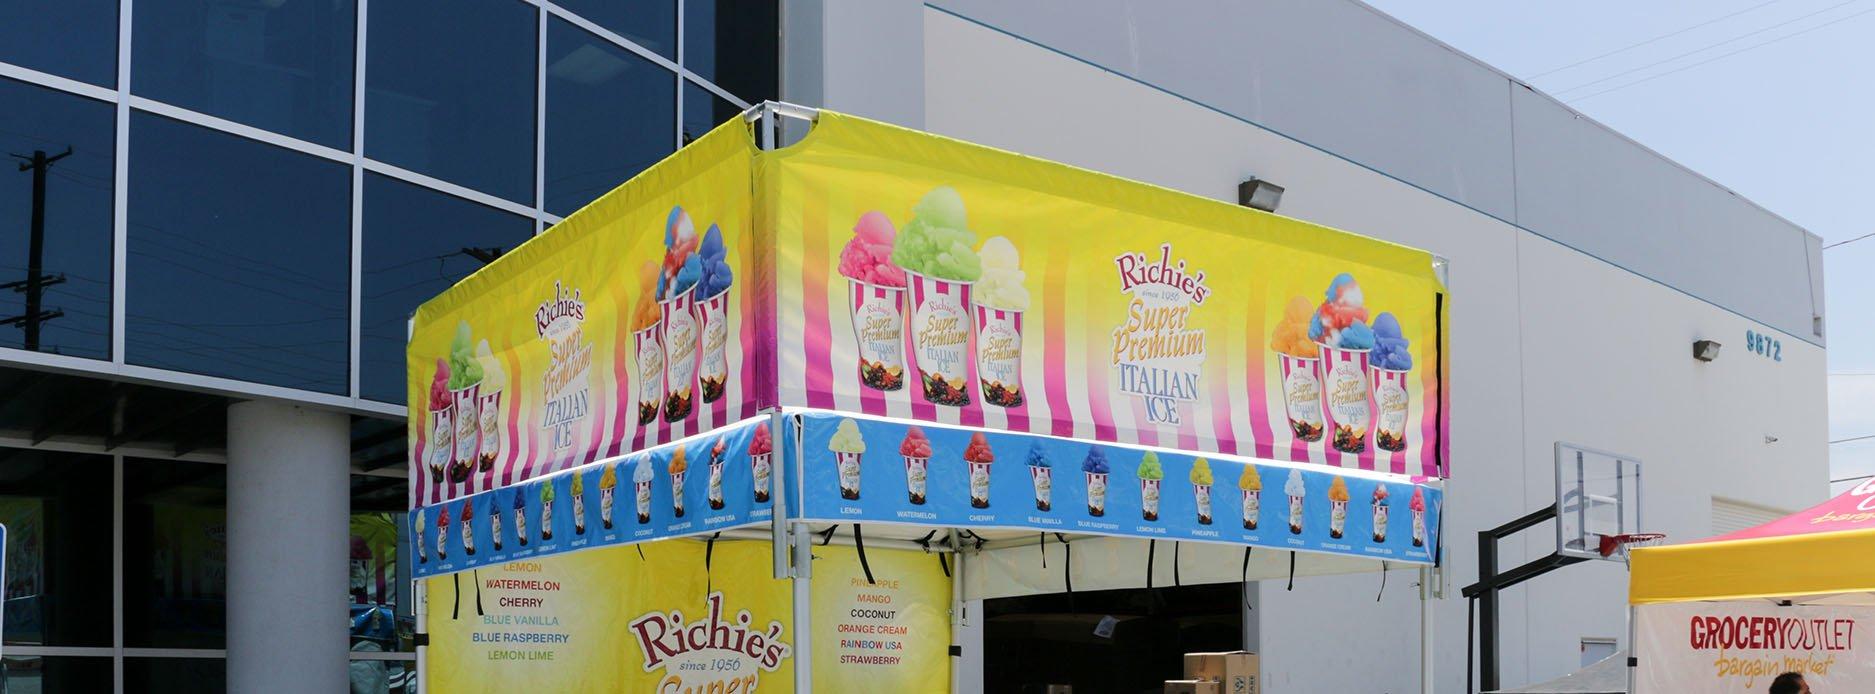 richies-italian-ice-header.jpg